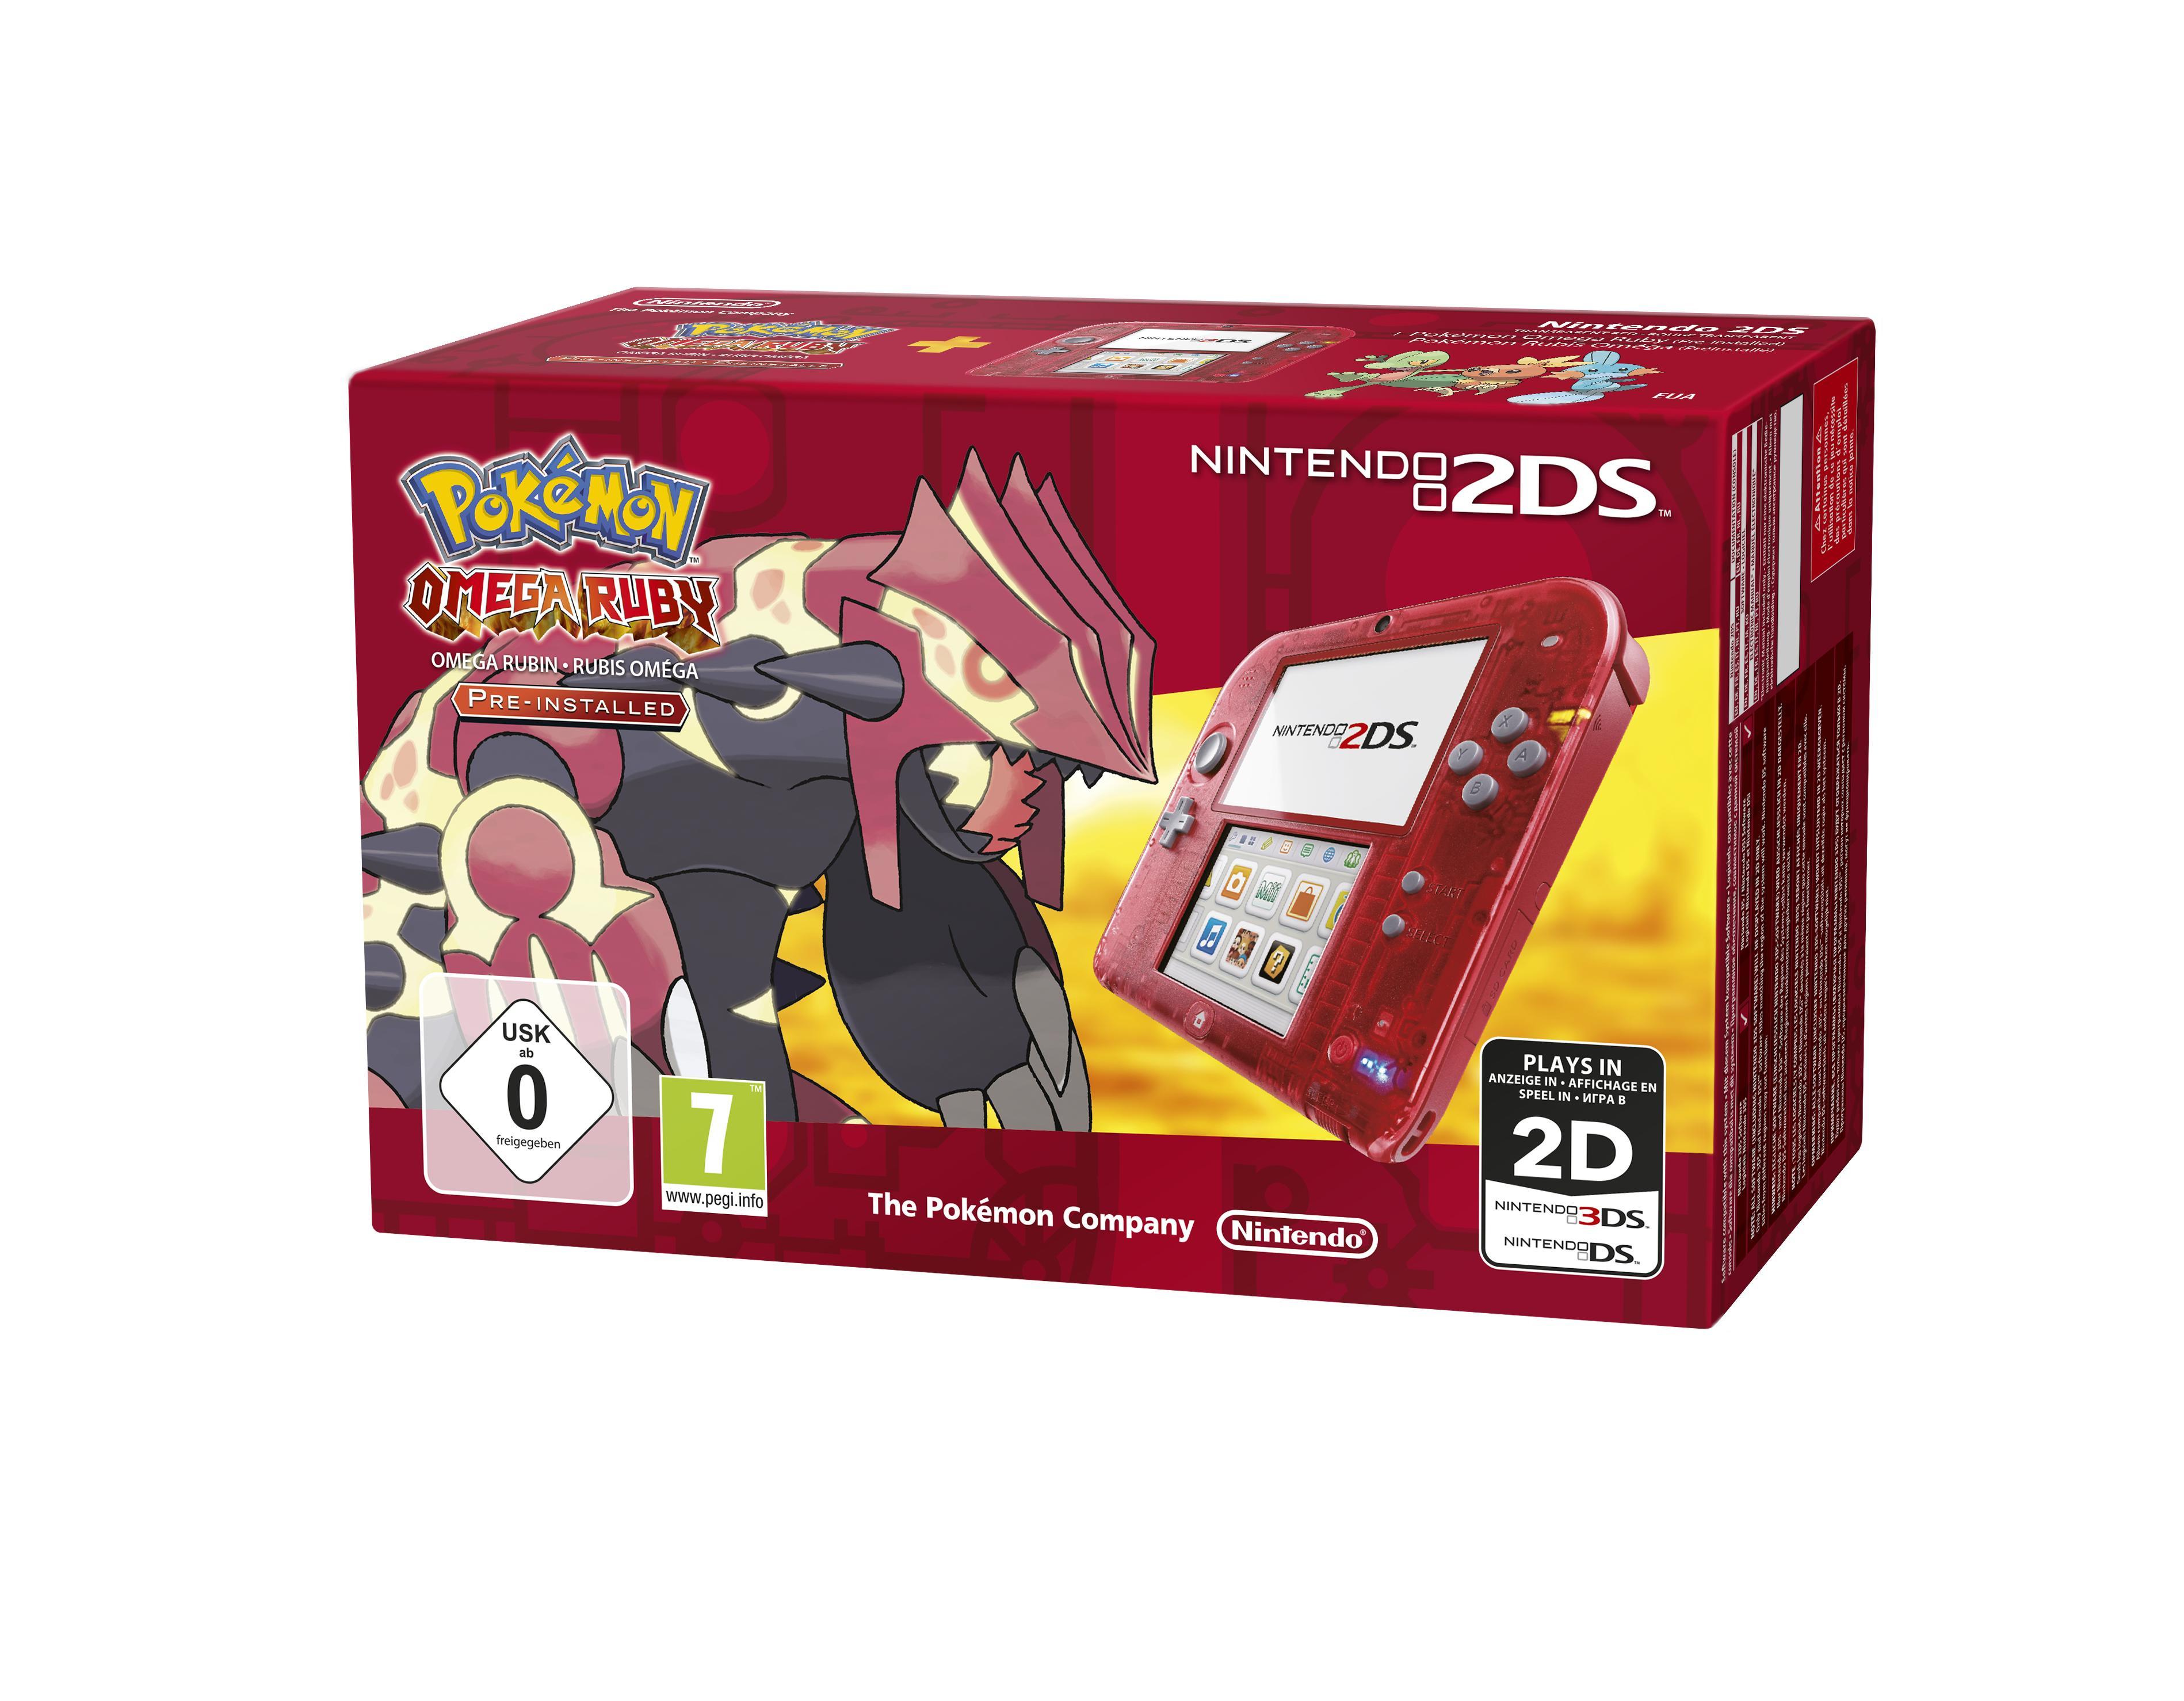 nintendo-2DS-transparent-red-pokemon-omega-ruby